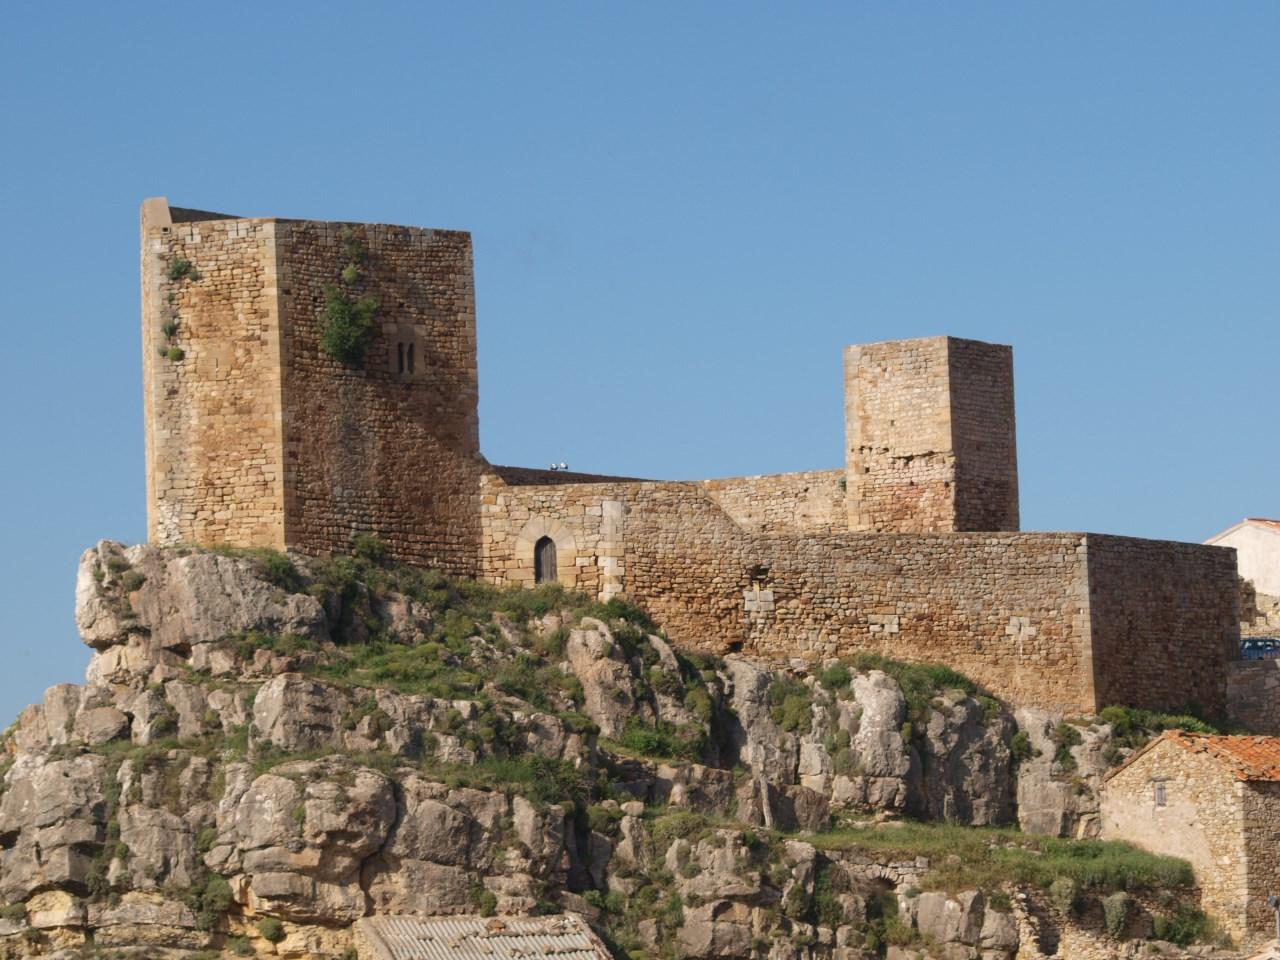 CASTILLO DE PUERTOMINGALVO (TERUEL)